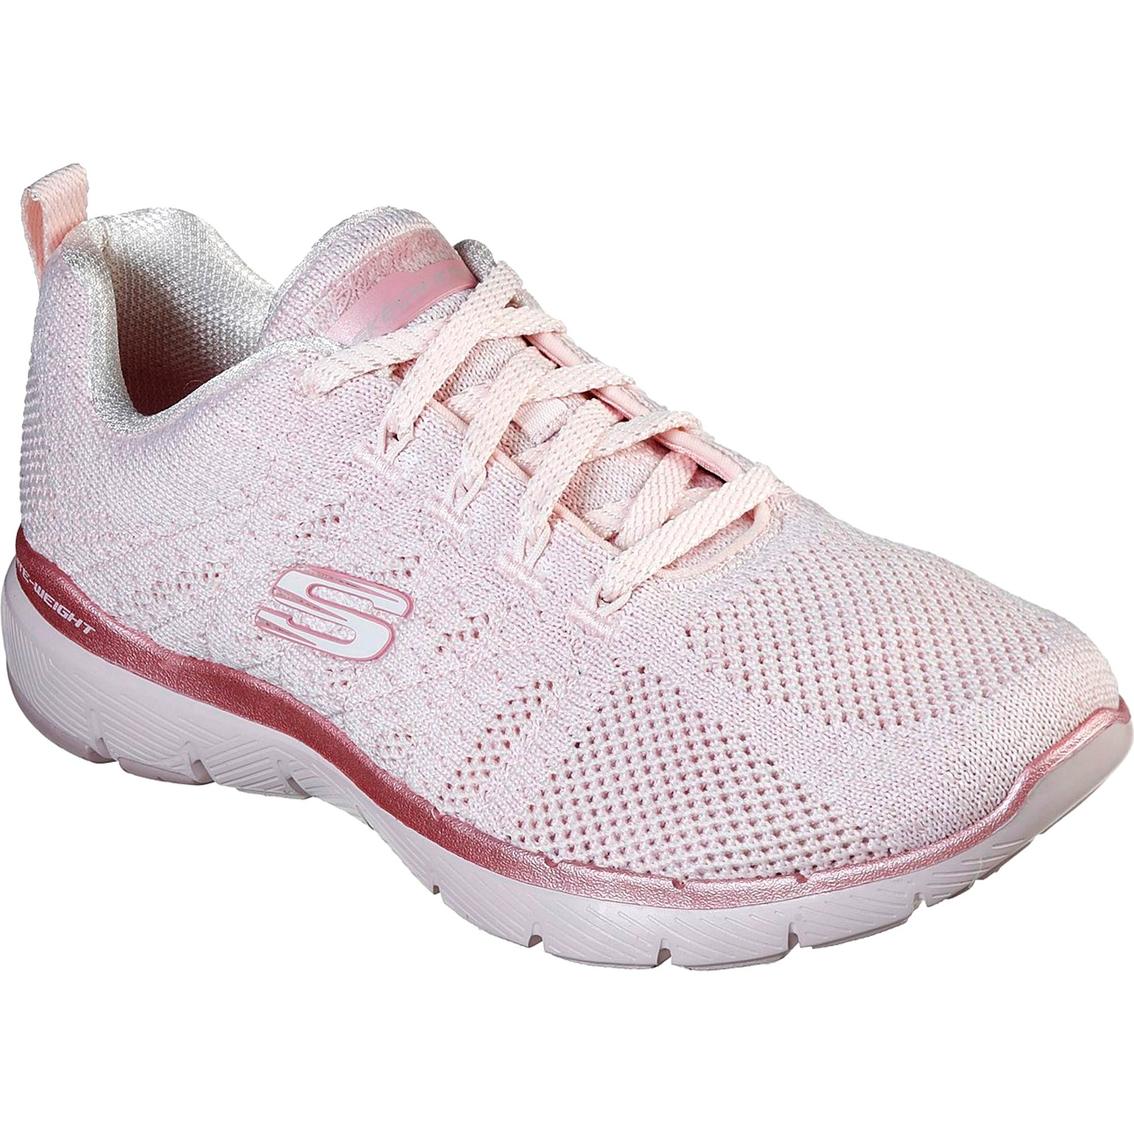 boy school trainer shoes lace lightweight comfort memory foam sock textile mesh